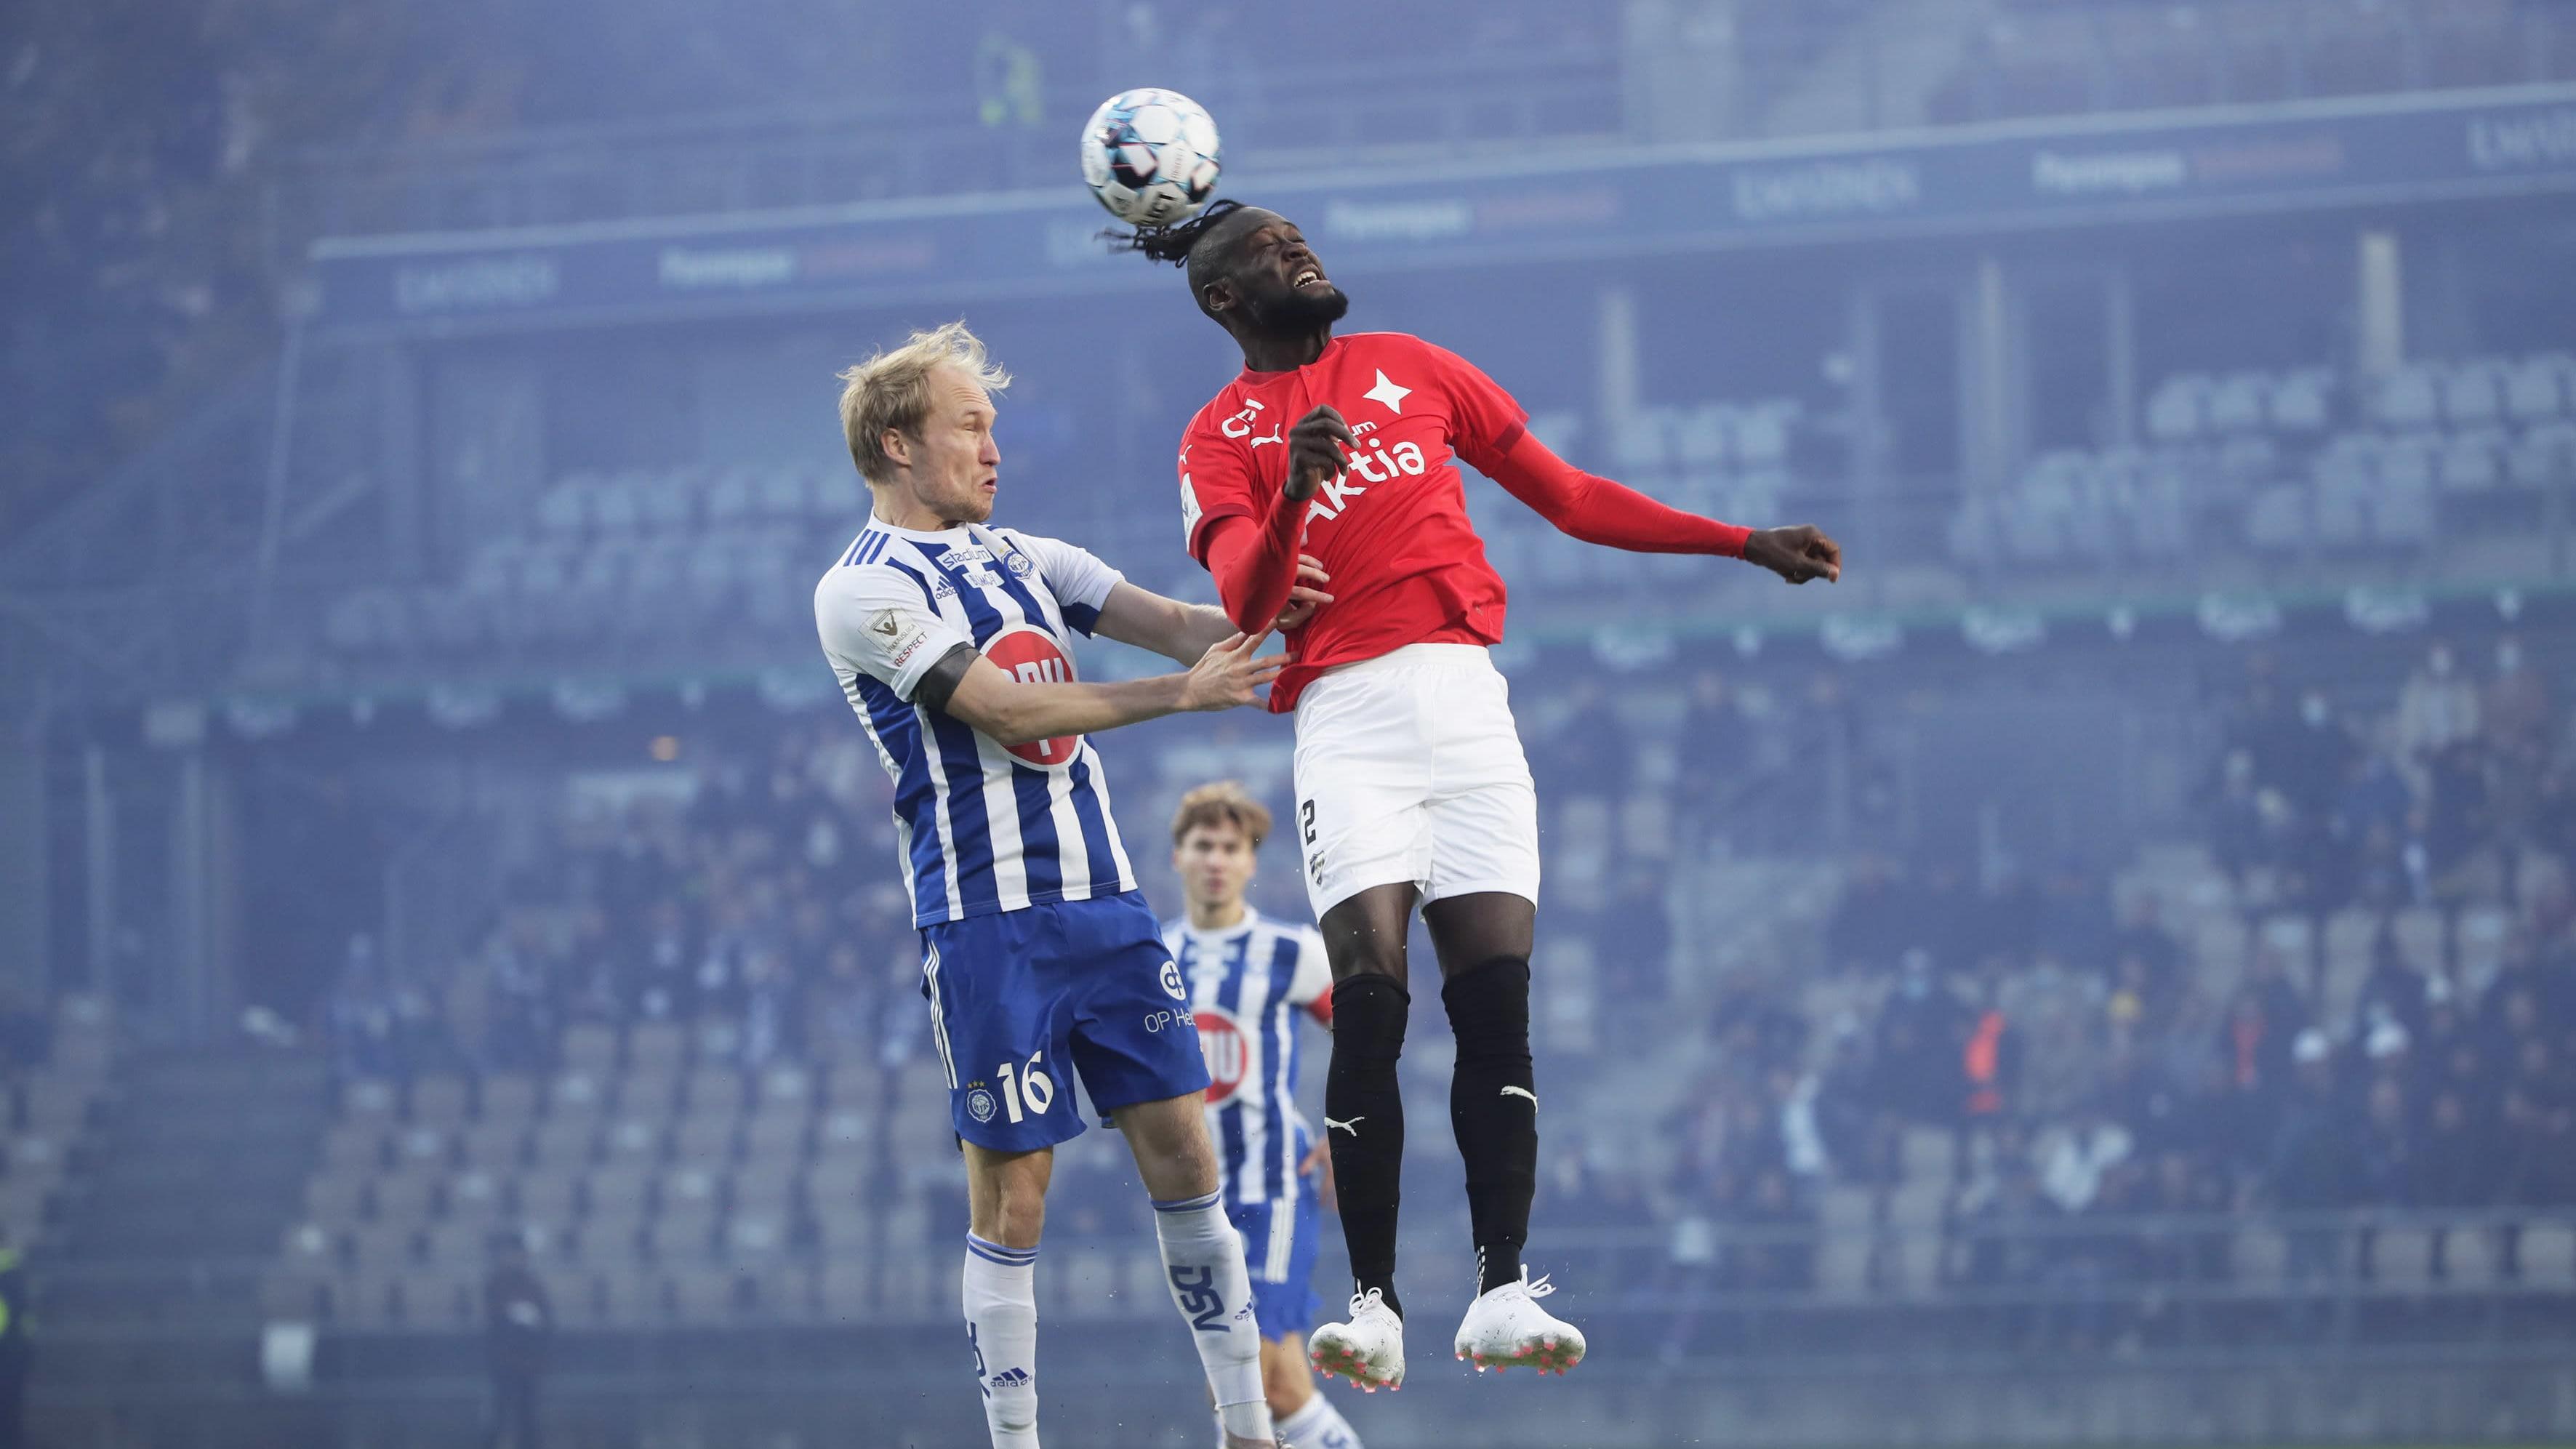 HJK:n Valtteri Moren ja HIFK:n Kei Kamara puskutilanteessa